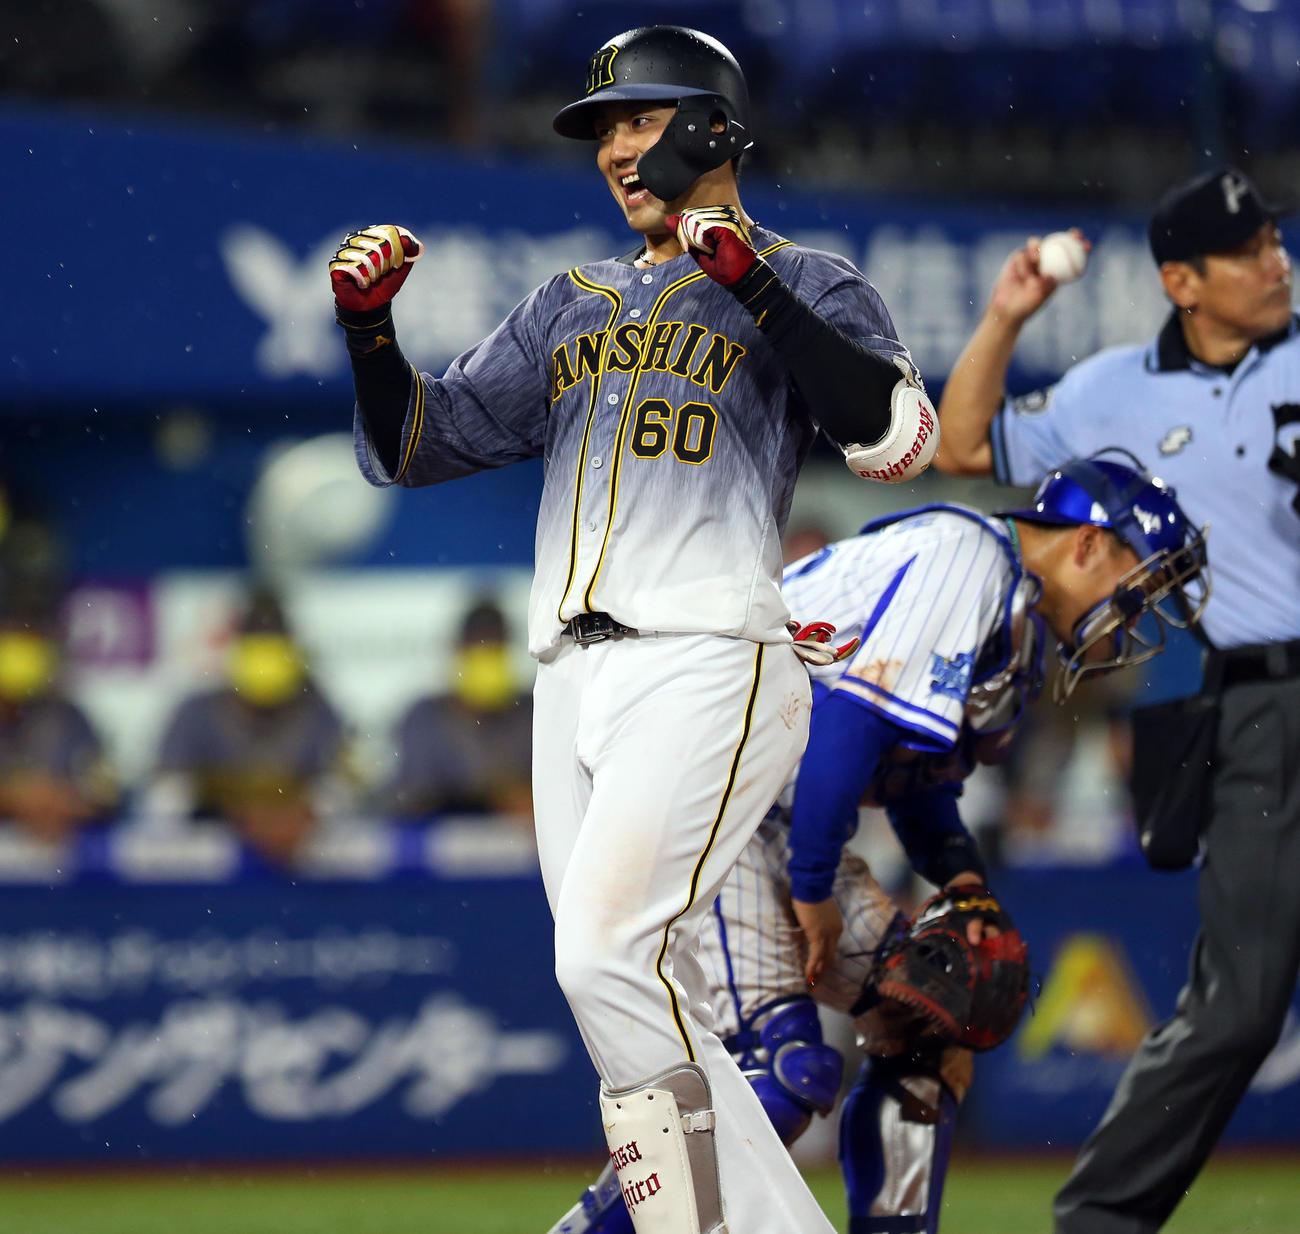 DeNA対阪神 4回表阪神2死一、二塁、左越え3点本塁打を放ち喜ぶ中谷(撮影・大野祥一)